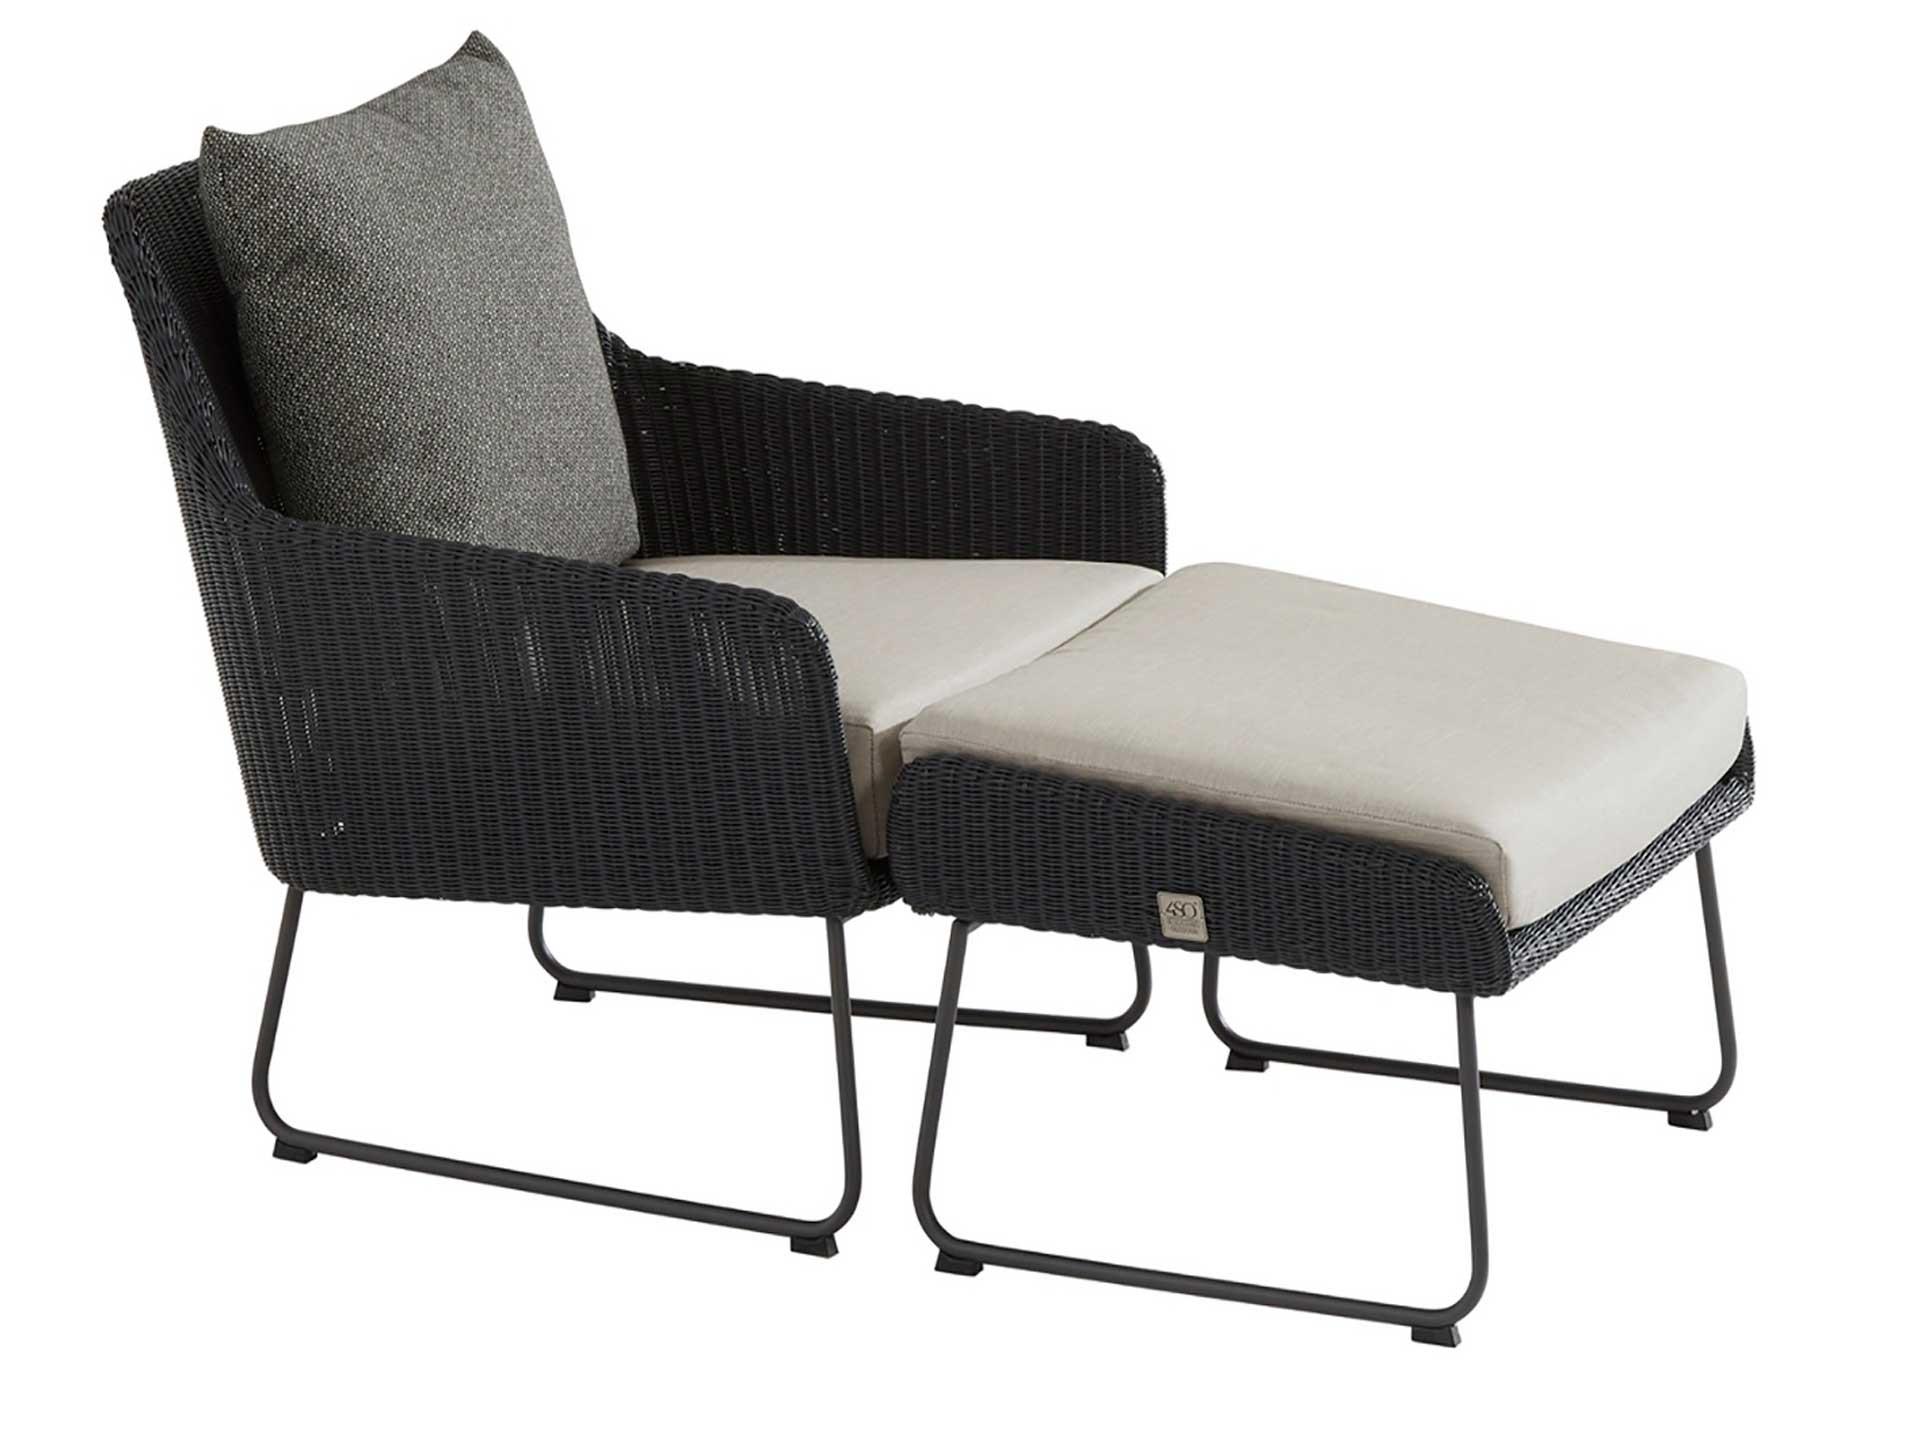 Avila anthracite lounge set